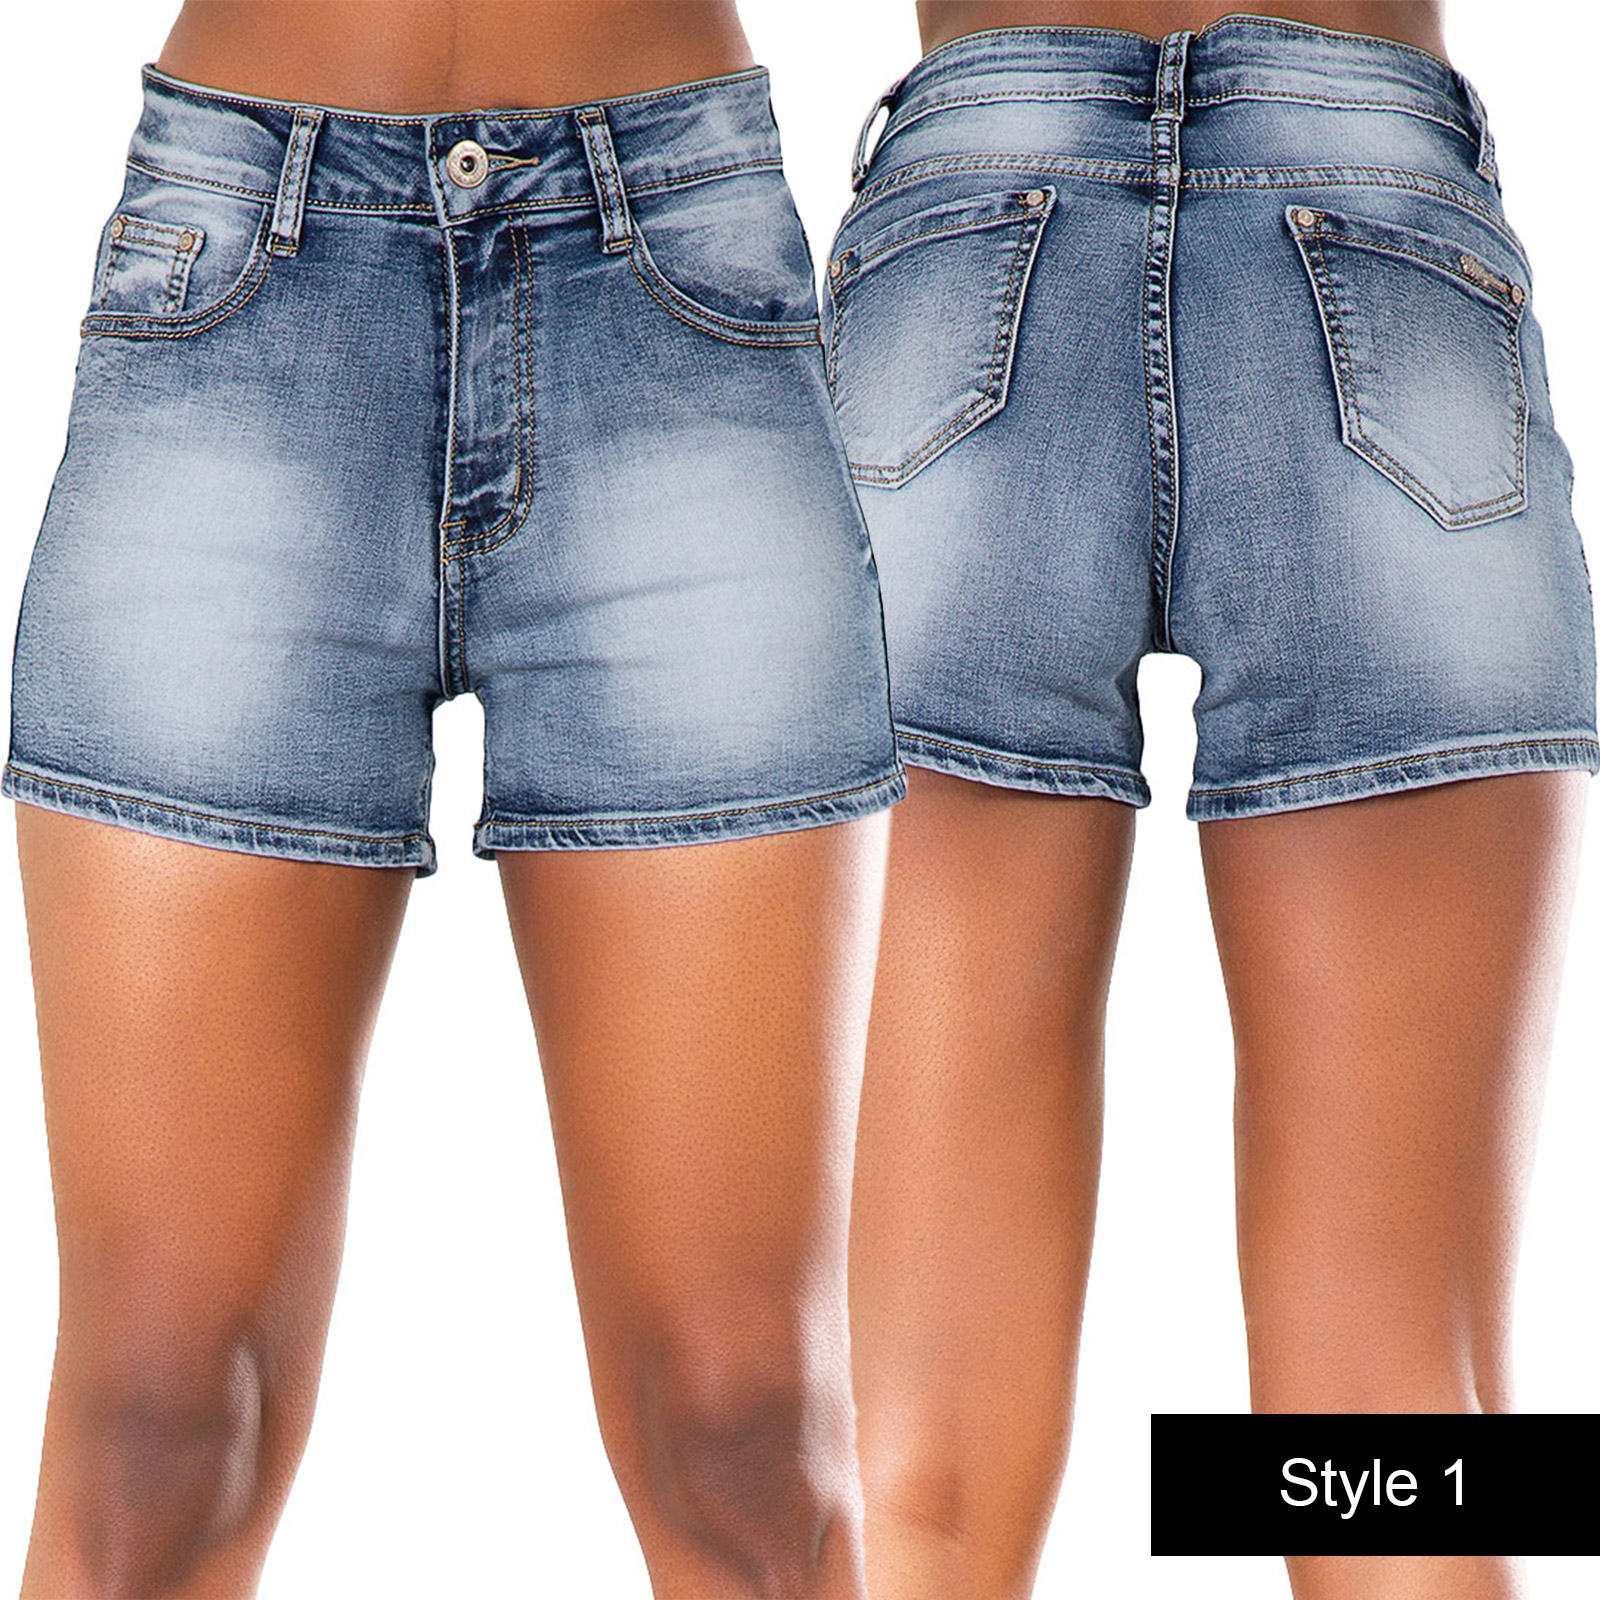 Ladies-Womens-Blue-Denim-High-Waisted-Shorts-Jeans-Hotpants-6-8-10-12-14